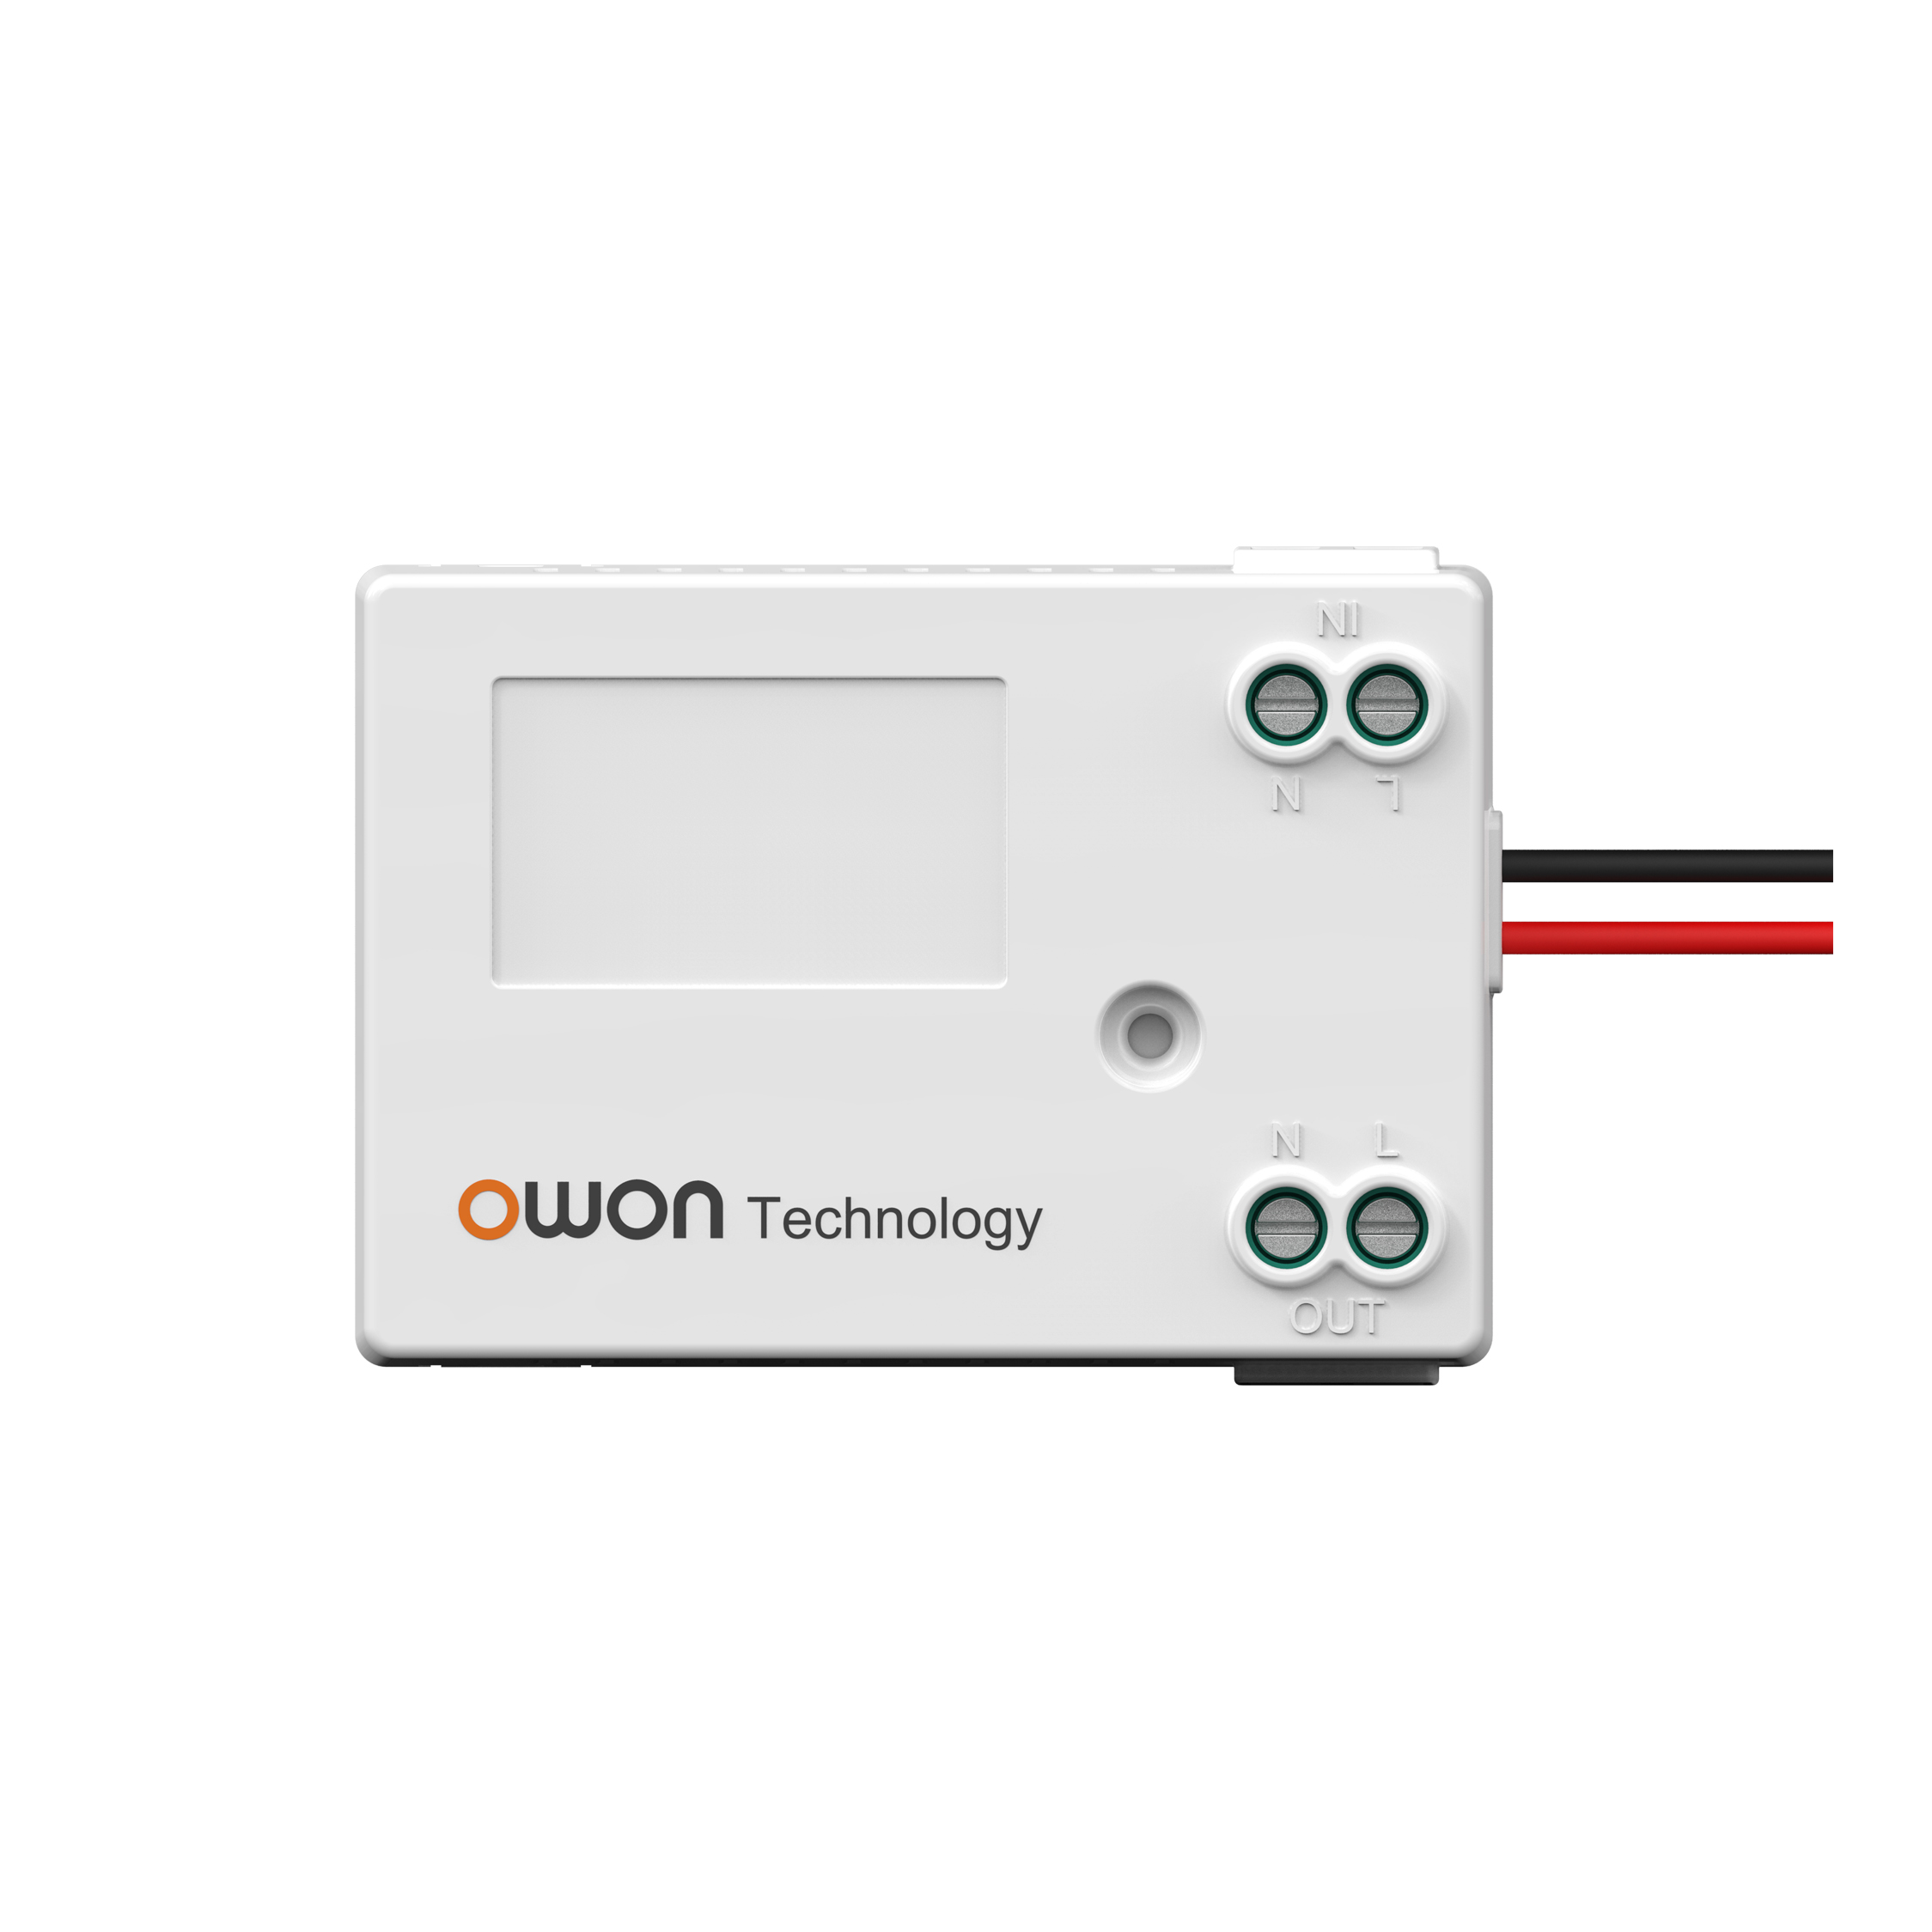 Zigbee Wireless 220v On Off Remote Control Relay Switch - Buy Wireless 220v  Switch,220v Remote Control Relay,Wireless Relay Switch Product on